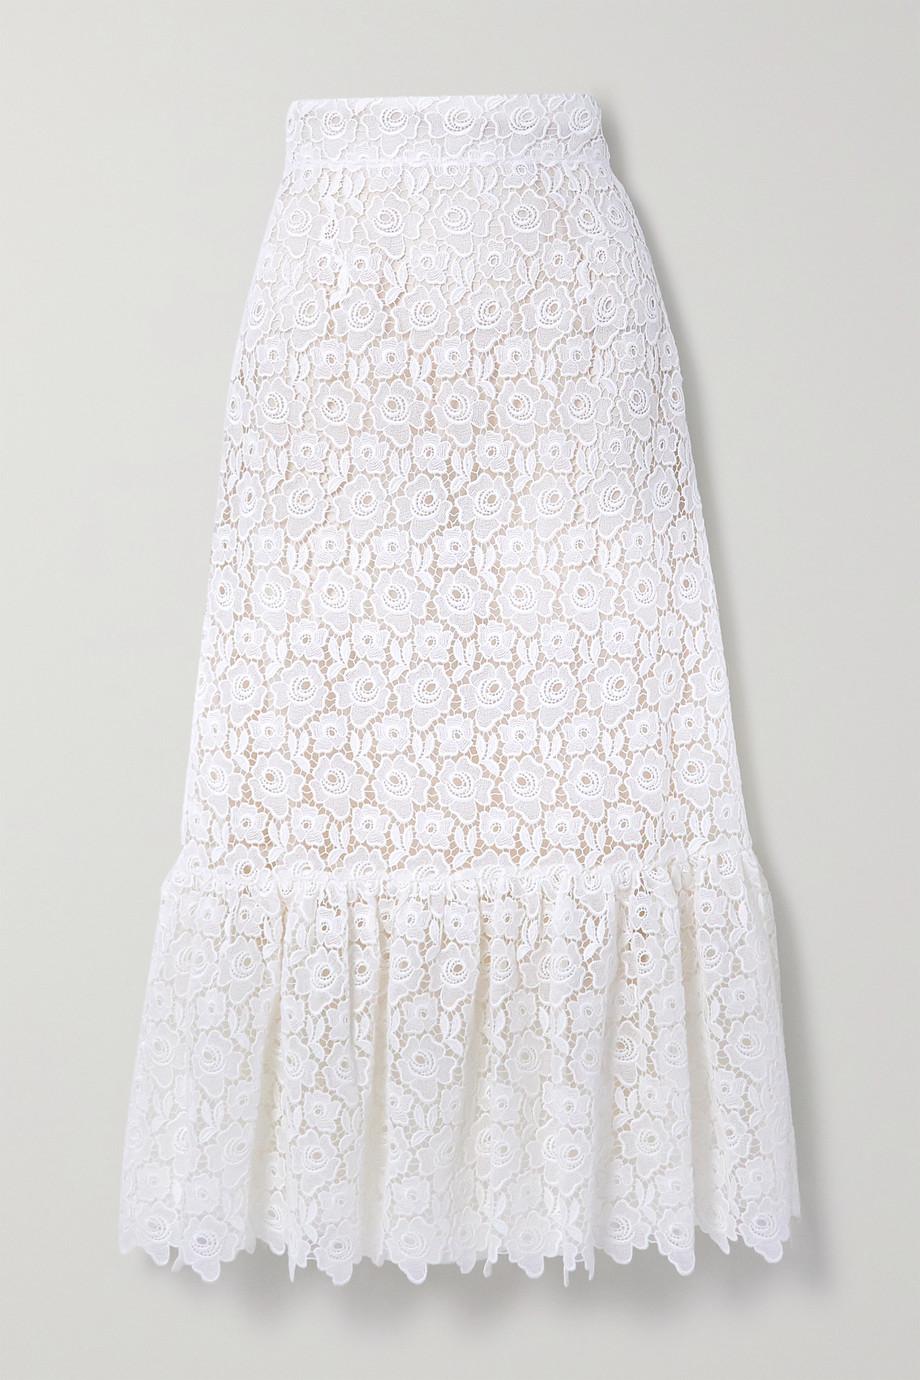 Miu Miu Ruffled cotton-blend guipure lace midi skirt